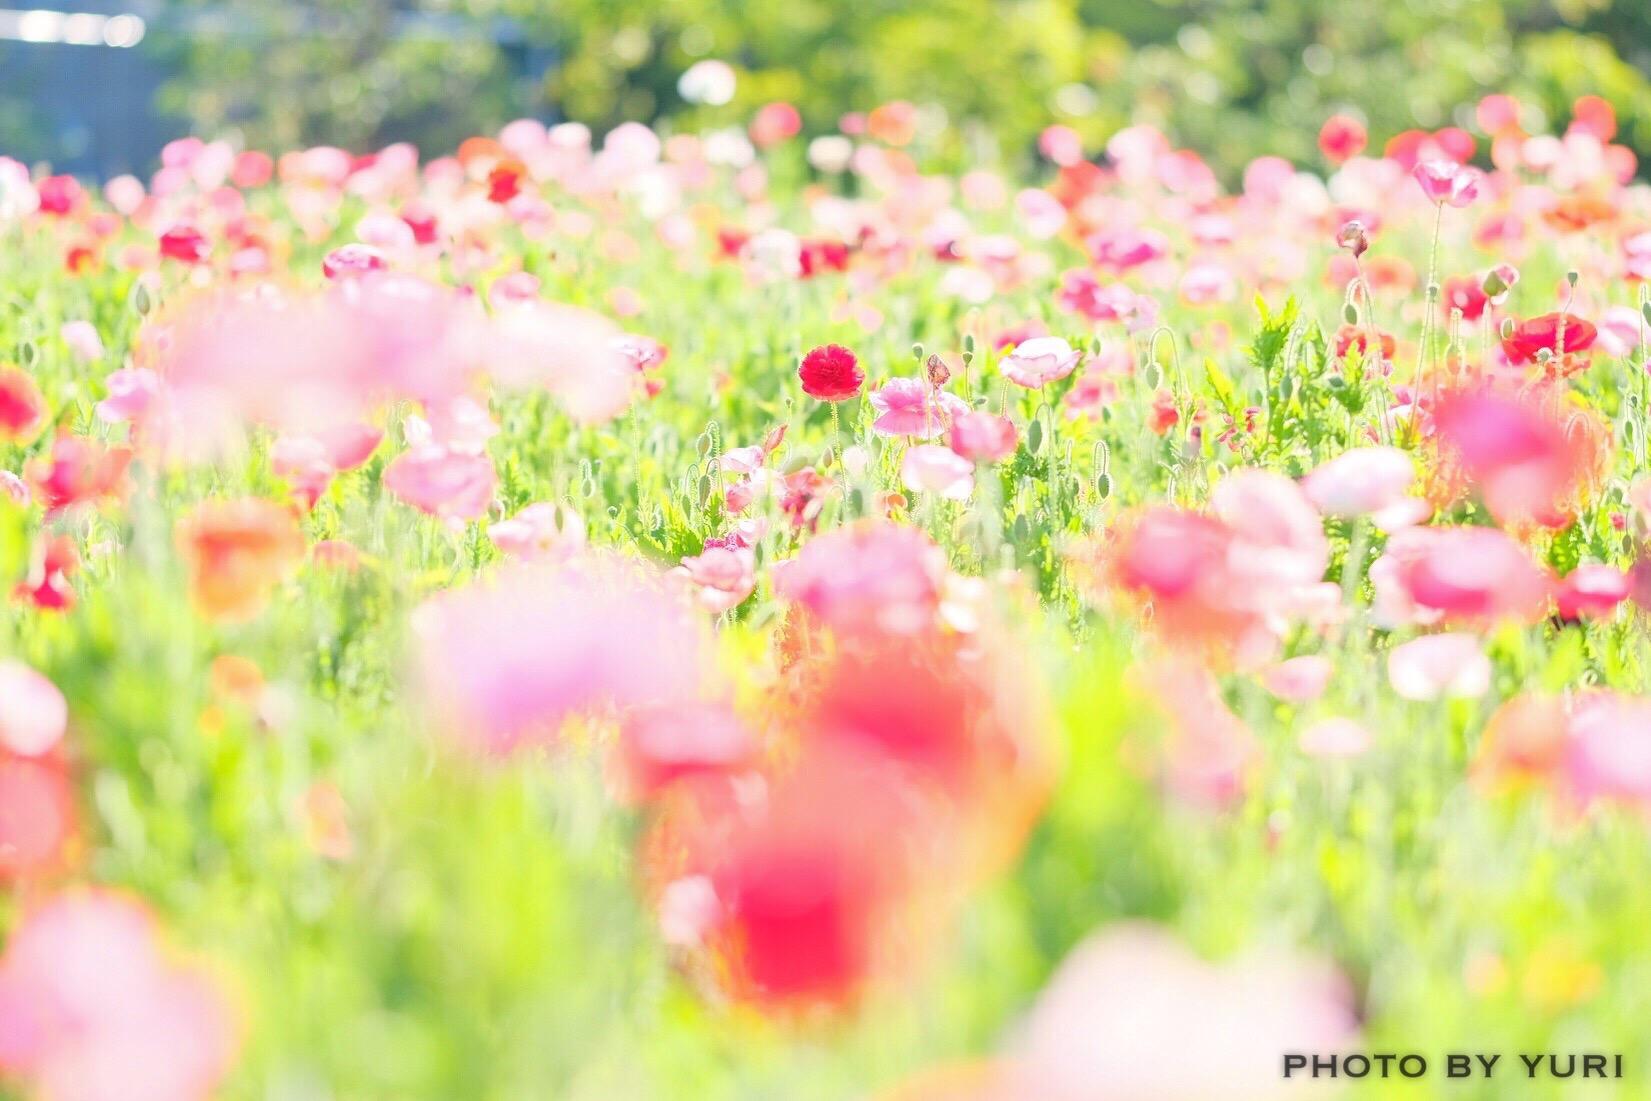 Zekkei Japanと 花 絶景 をテーマに コラボ壁紙を作成しました